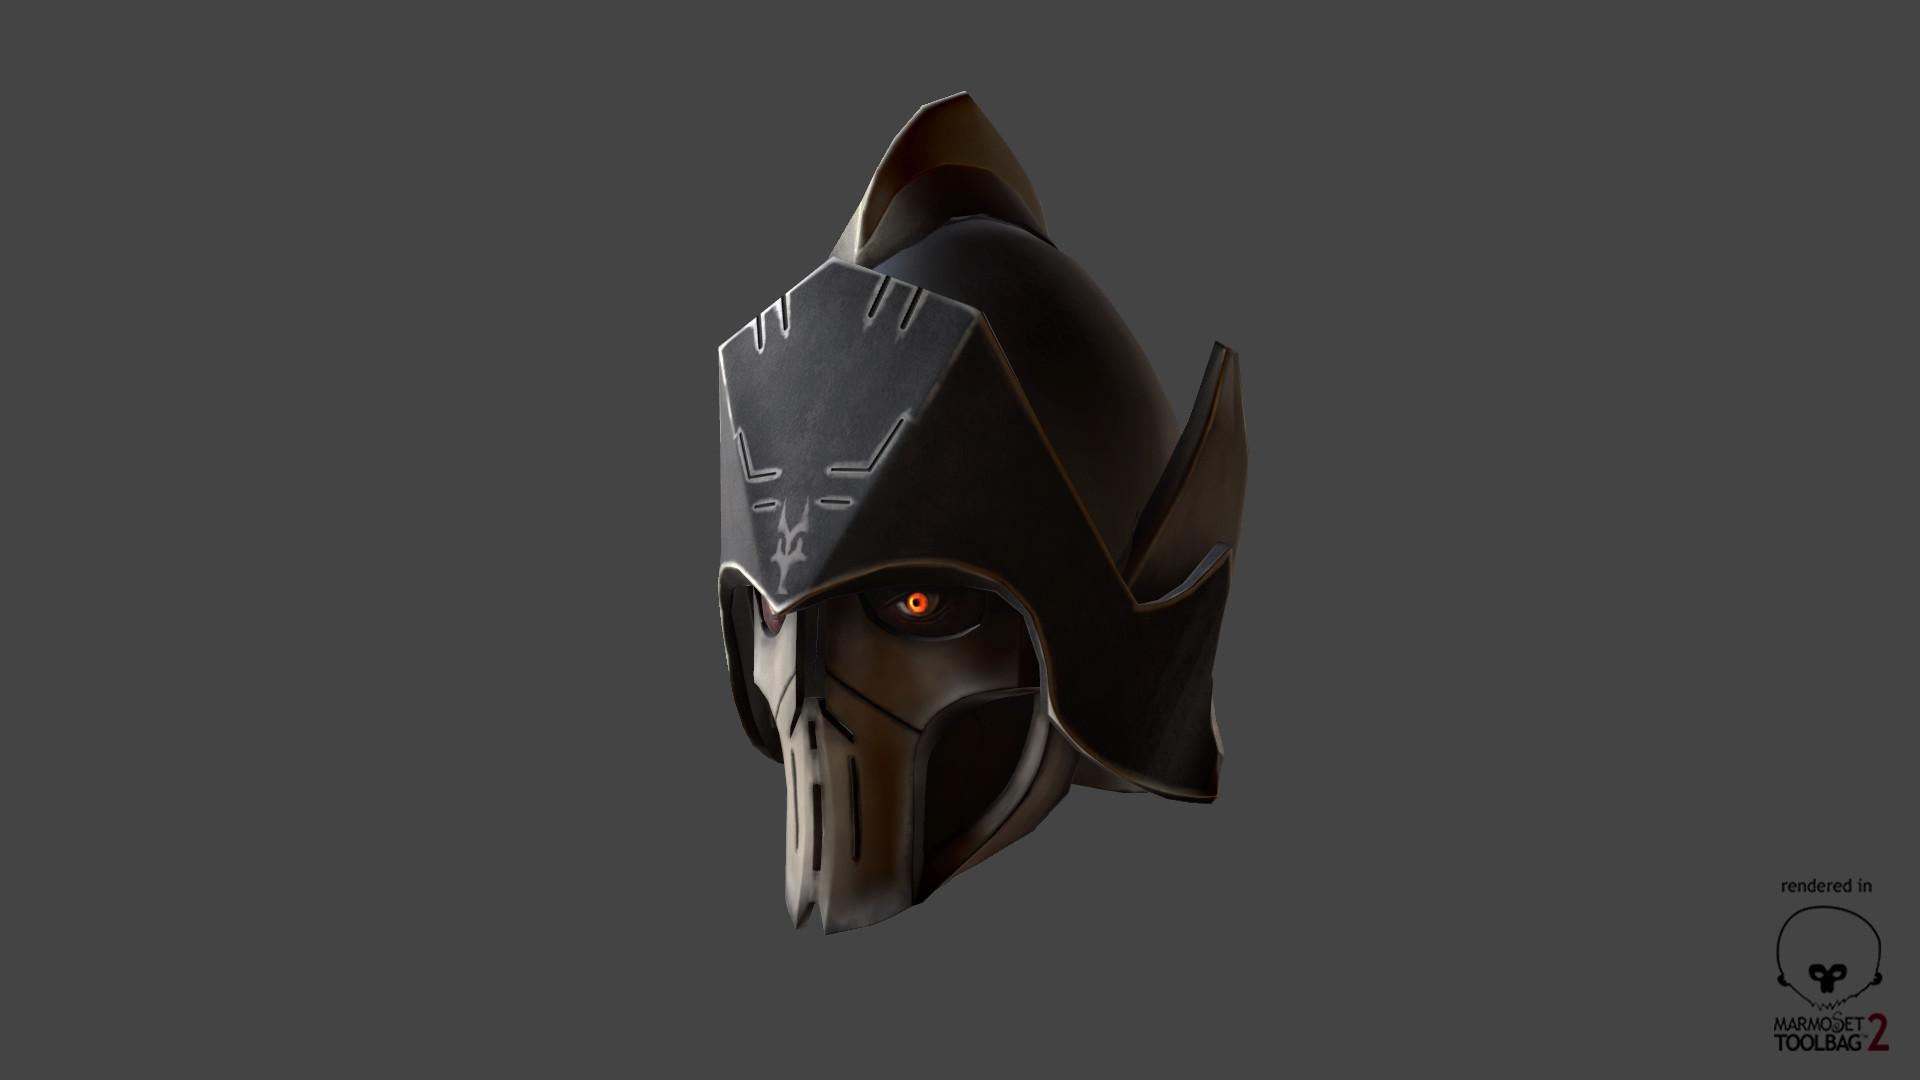 Artstation Darth Bane S Helmet Star Wars The Clone Wars Piotr Bienkowski